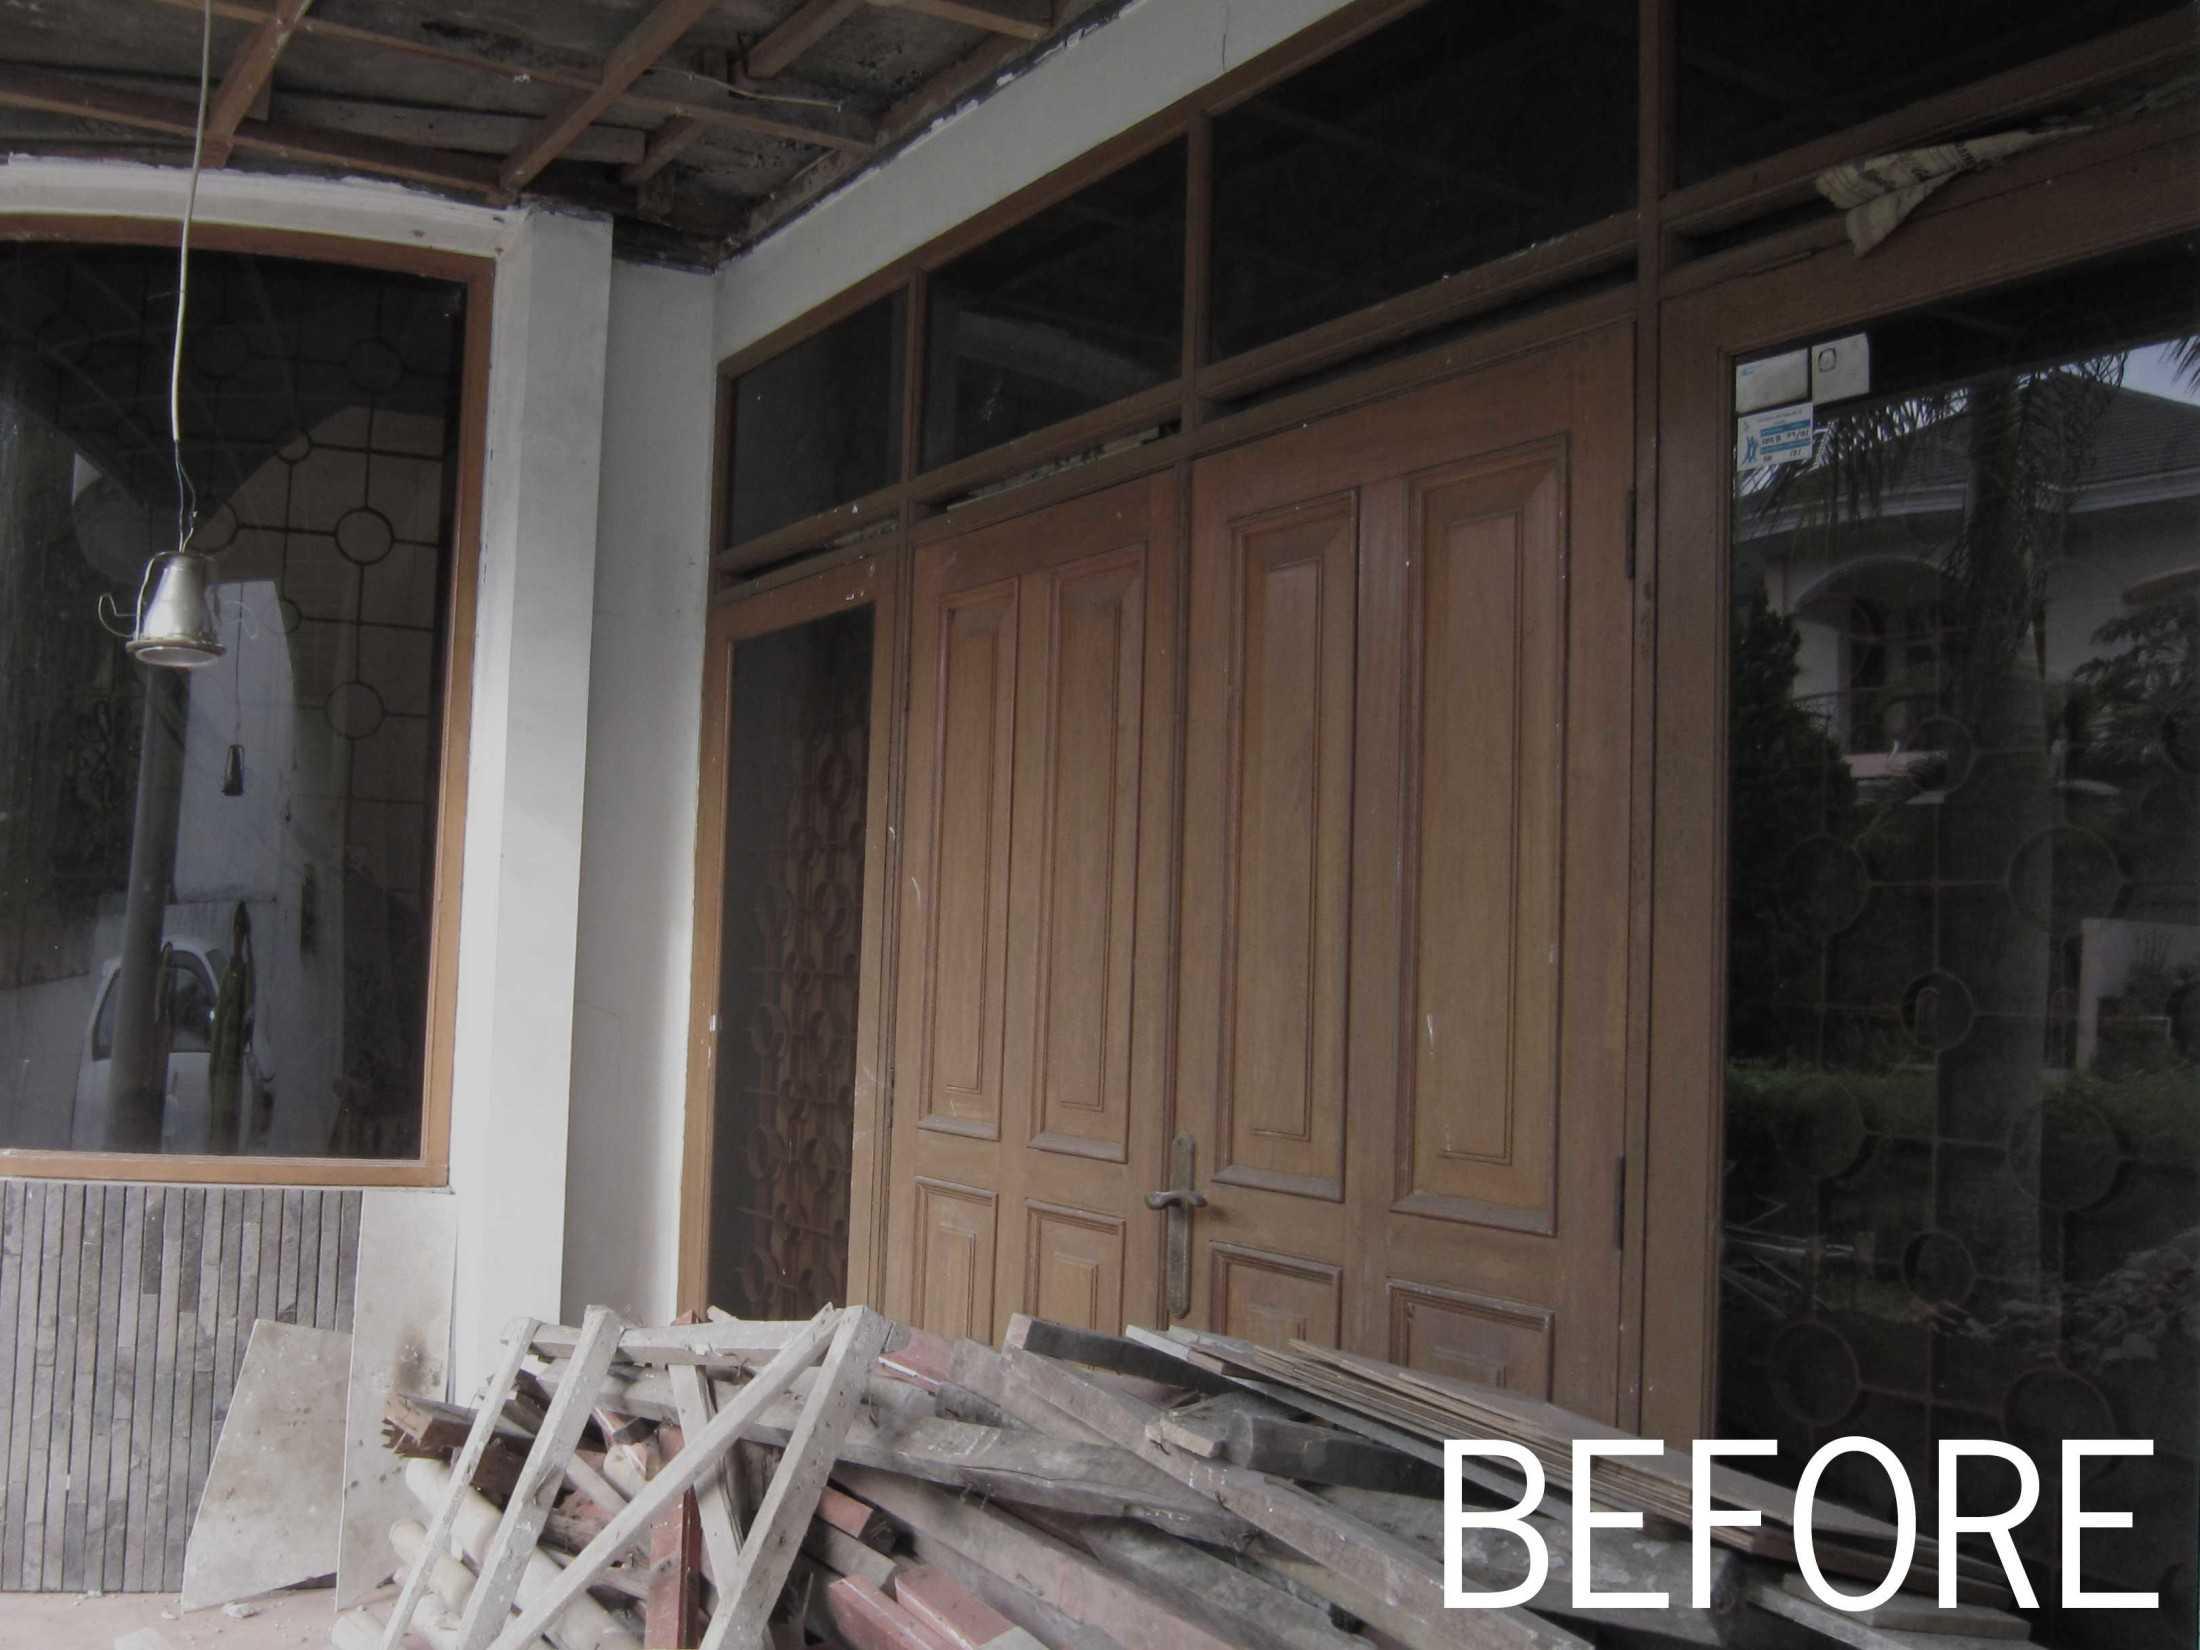 Arkitekt.id Setraduta Kencana Bandung Bandung Sk House - Existing  69580